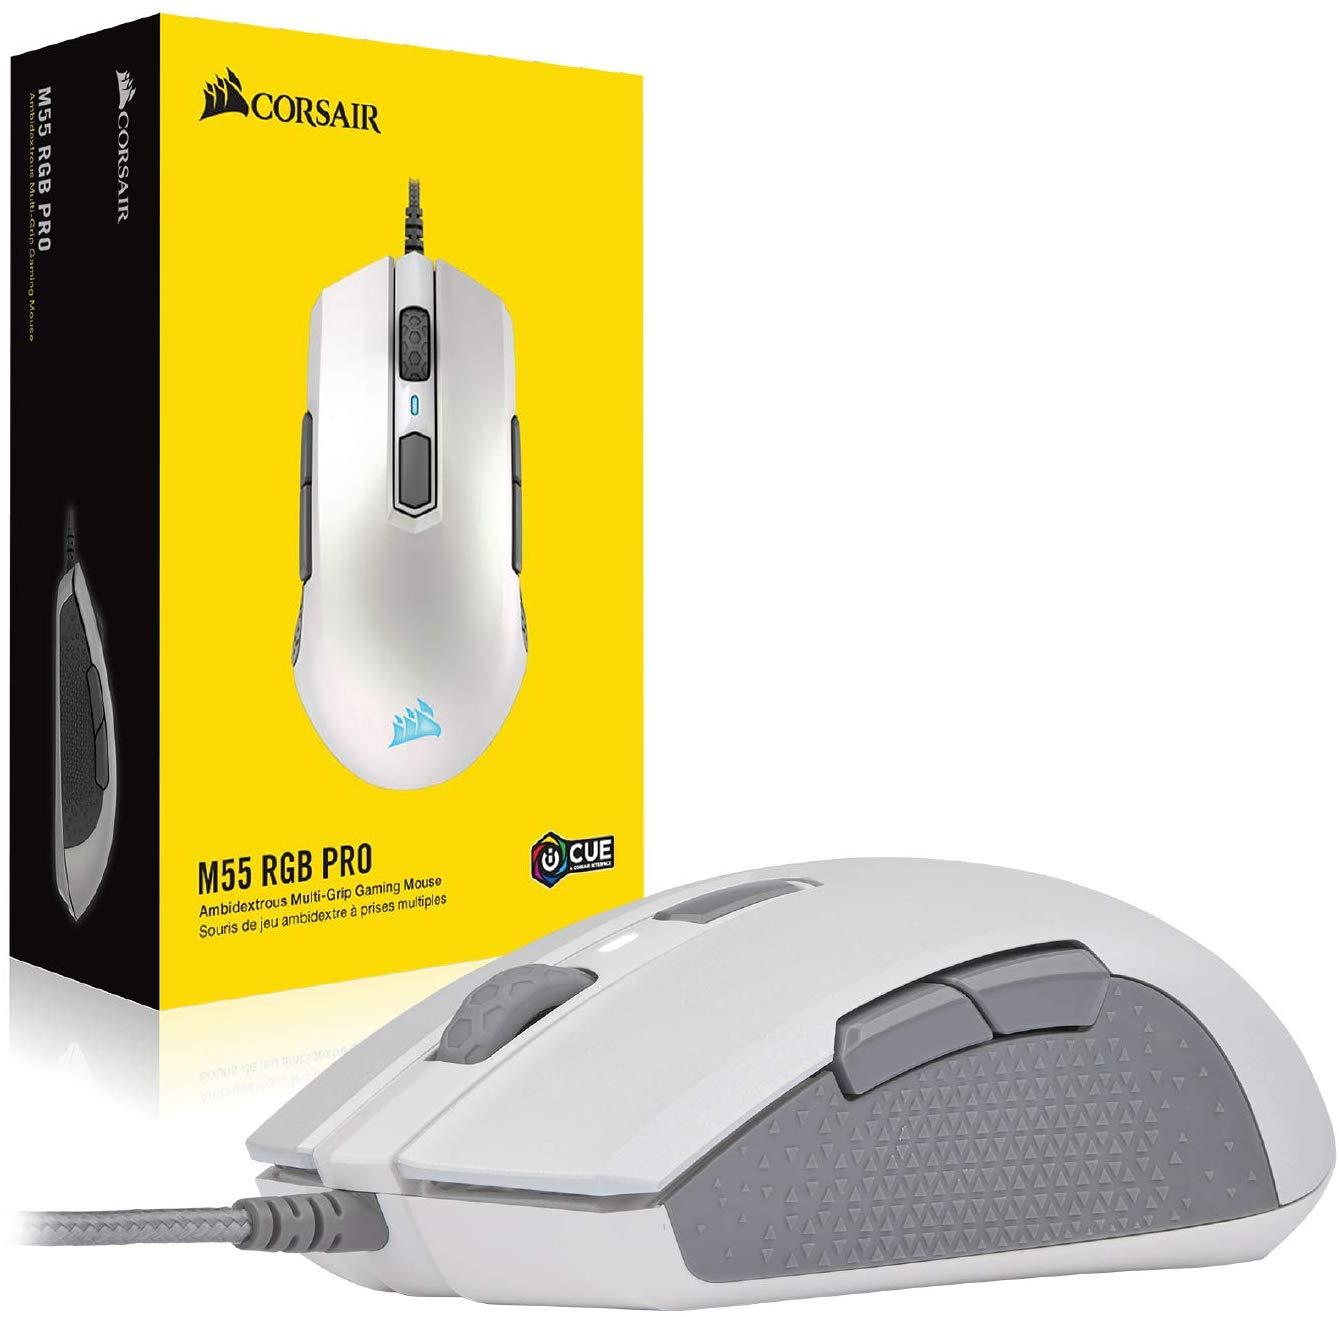 Corsair M55 RGB Pro Wired Gaming Mouse ของแท้ ประกันศูนย์ 2ปี (White)